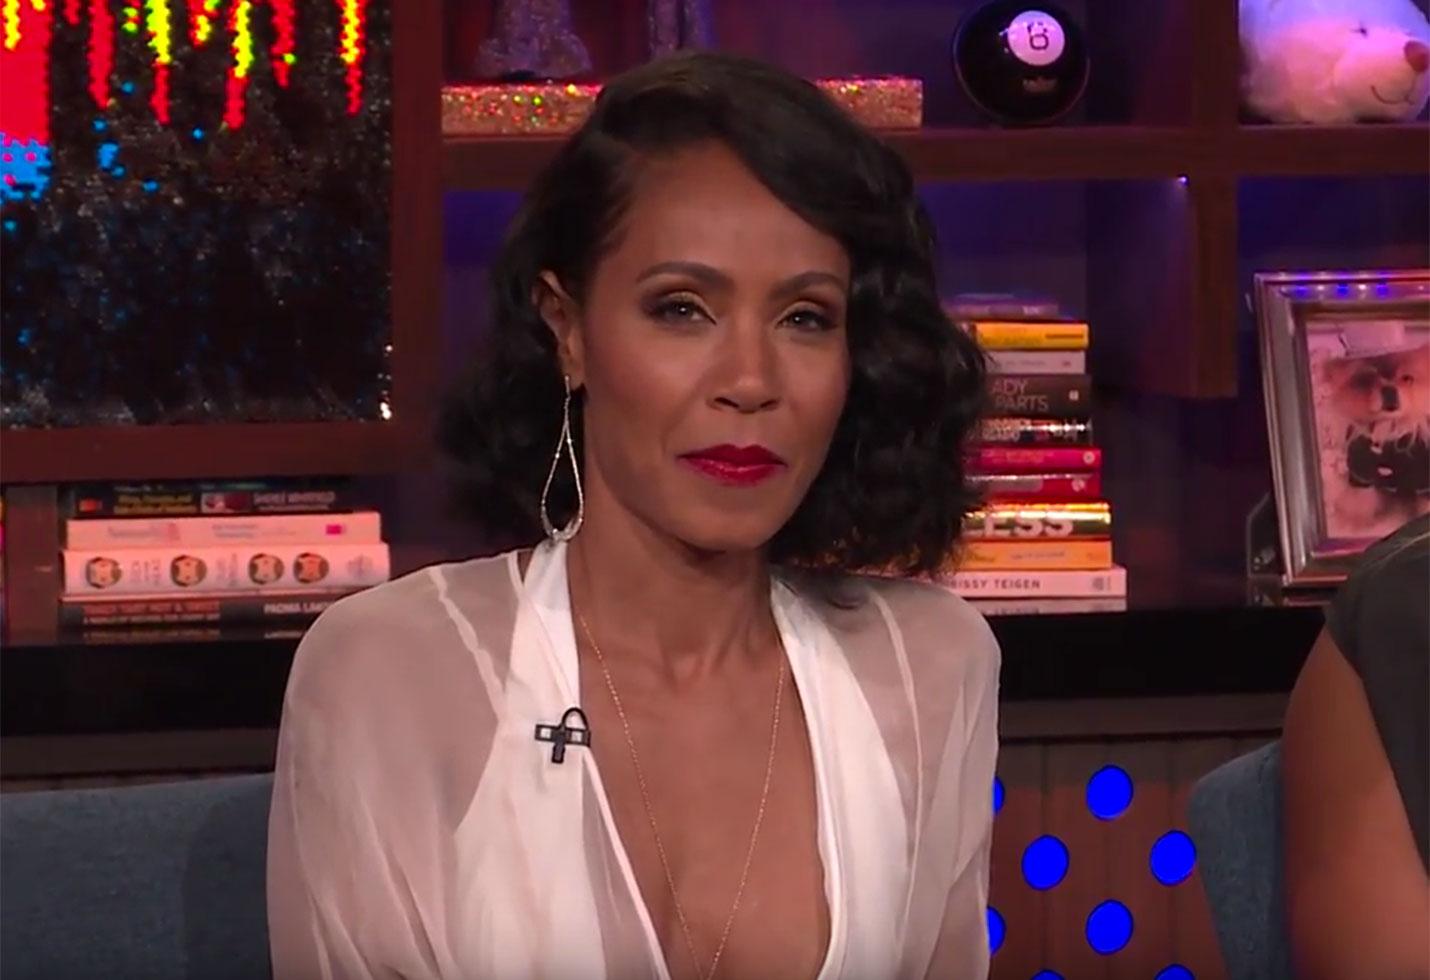 [VIDEO] Jada Pinkett Smith Wishes She Was Swinger With Husband